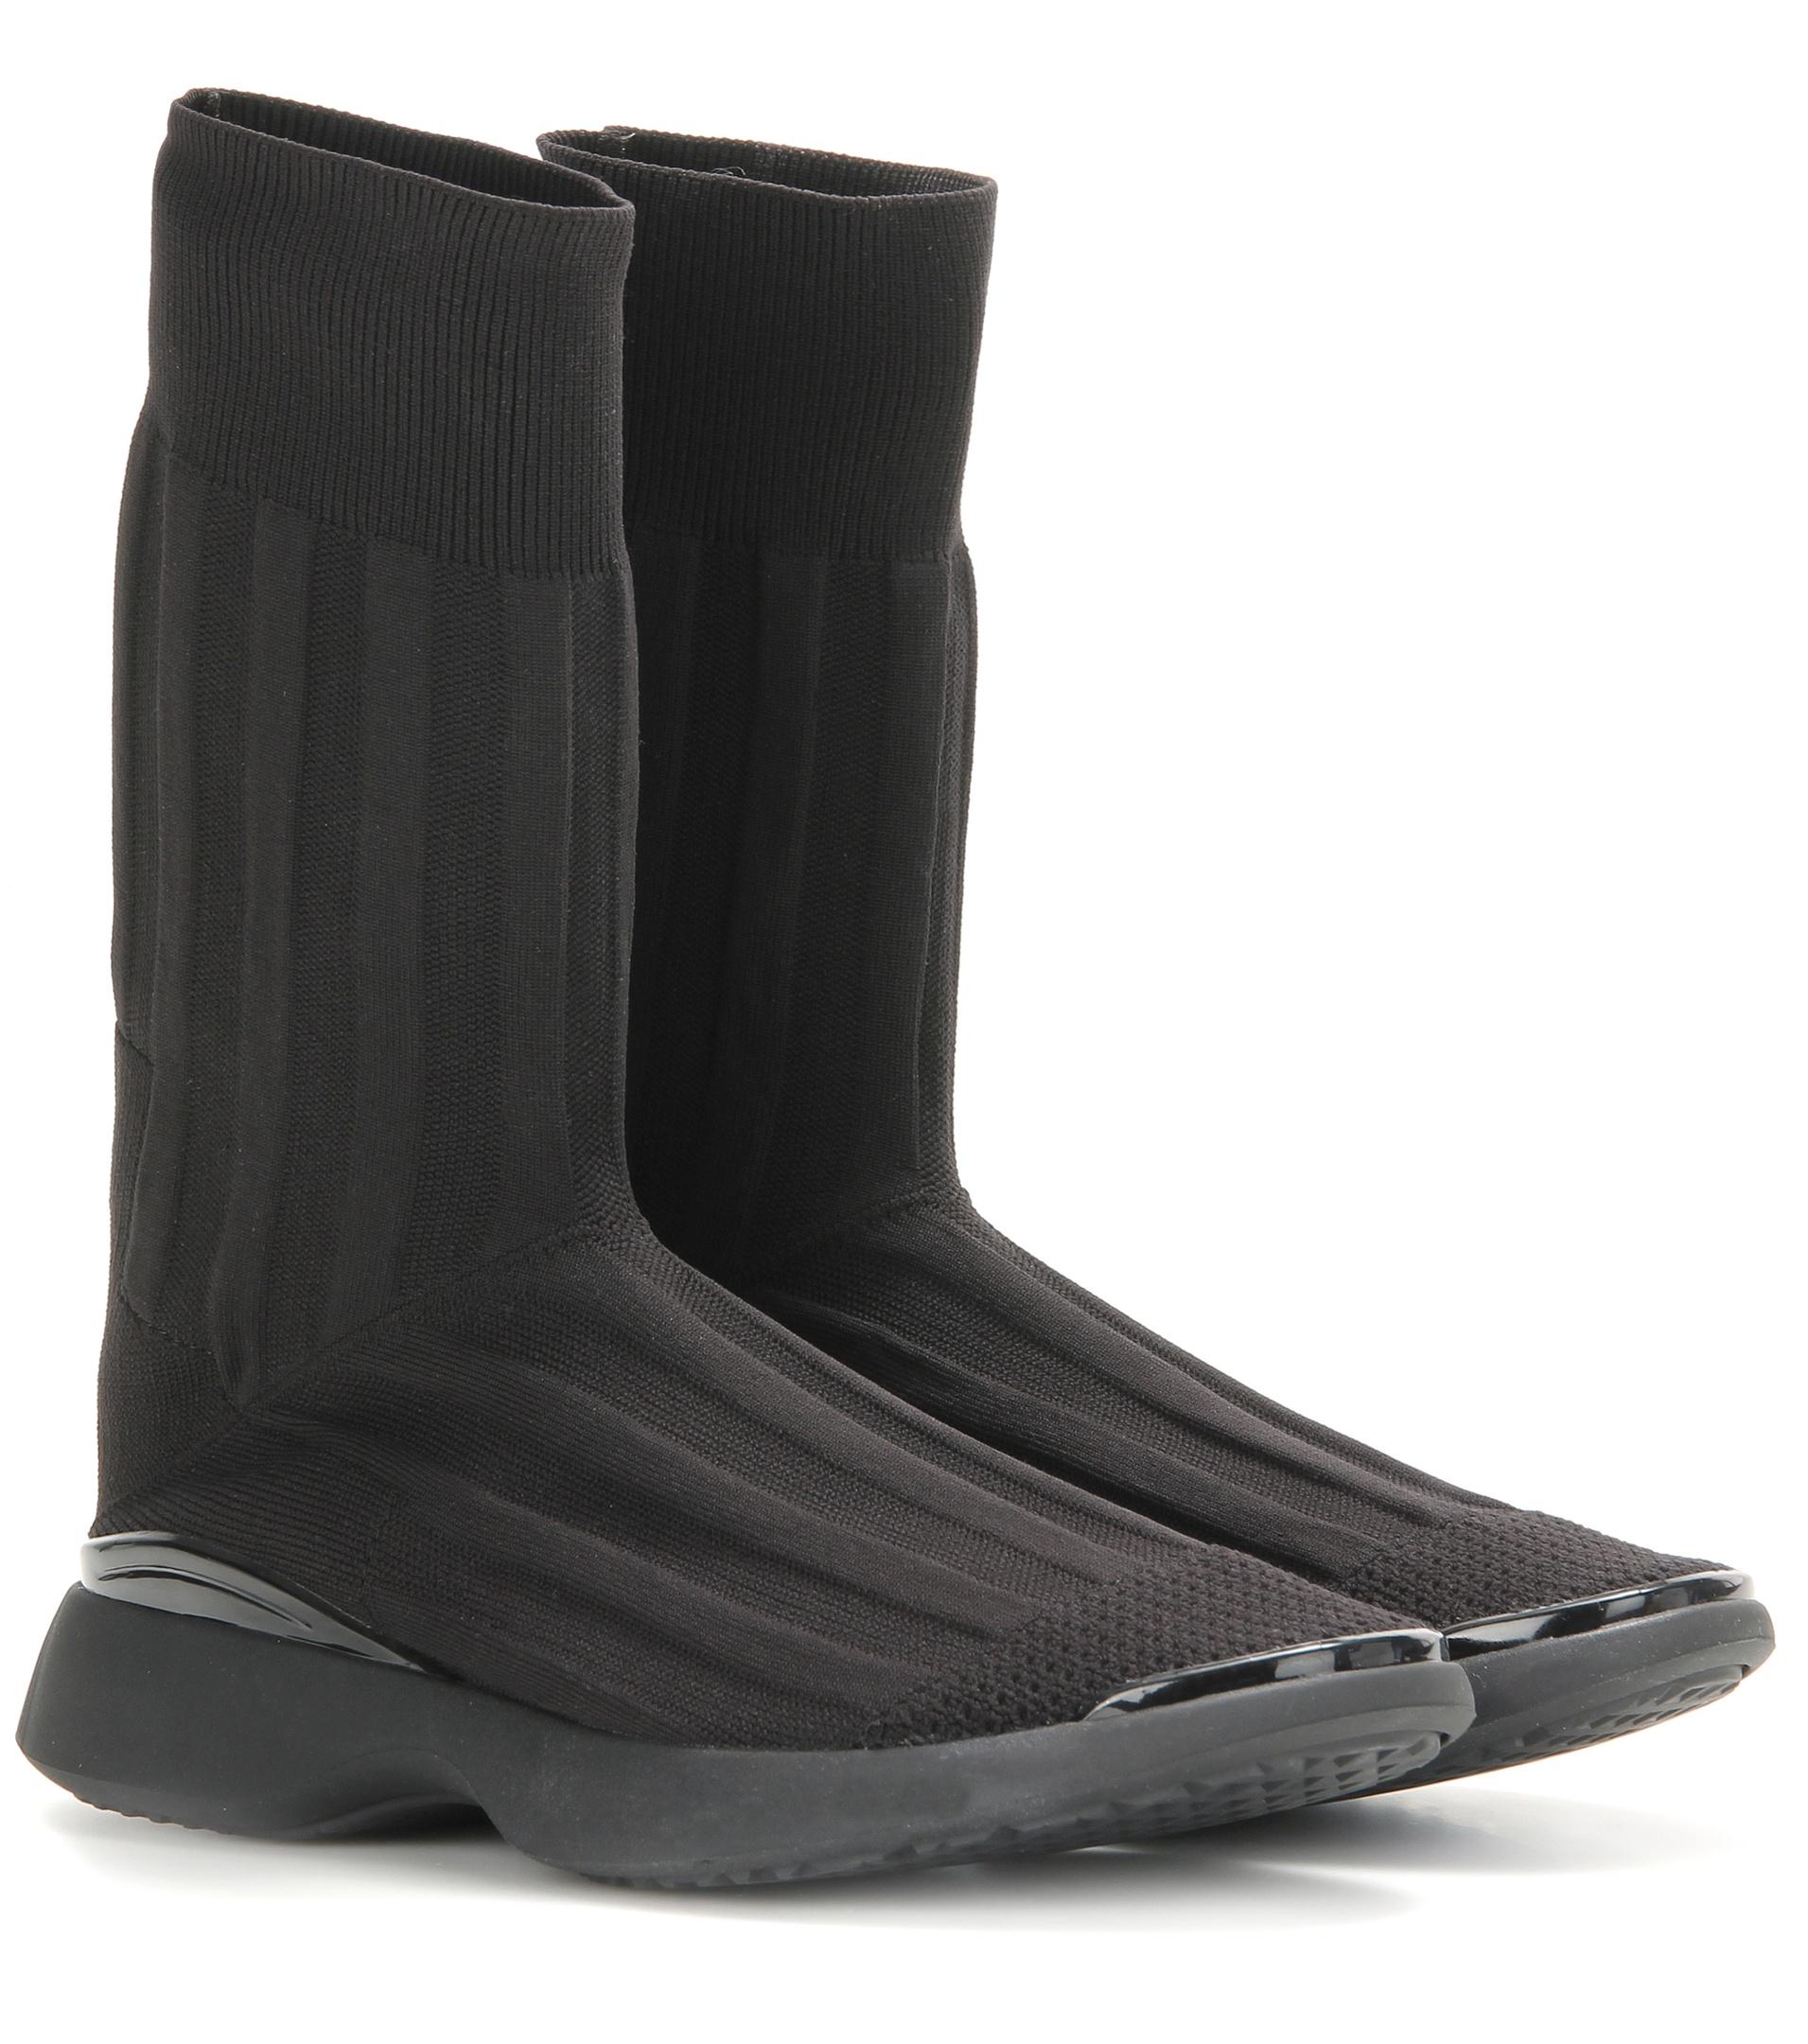 acne batilda knit boots in black save 12 lyst